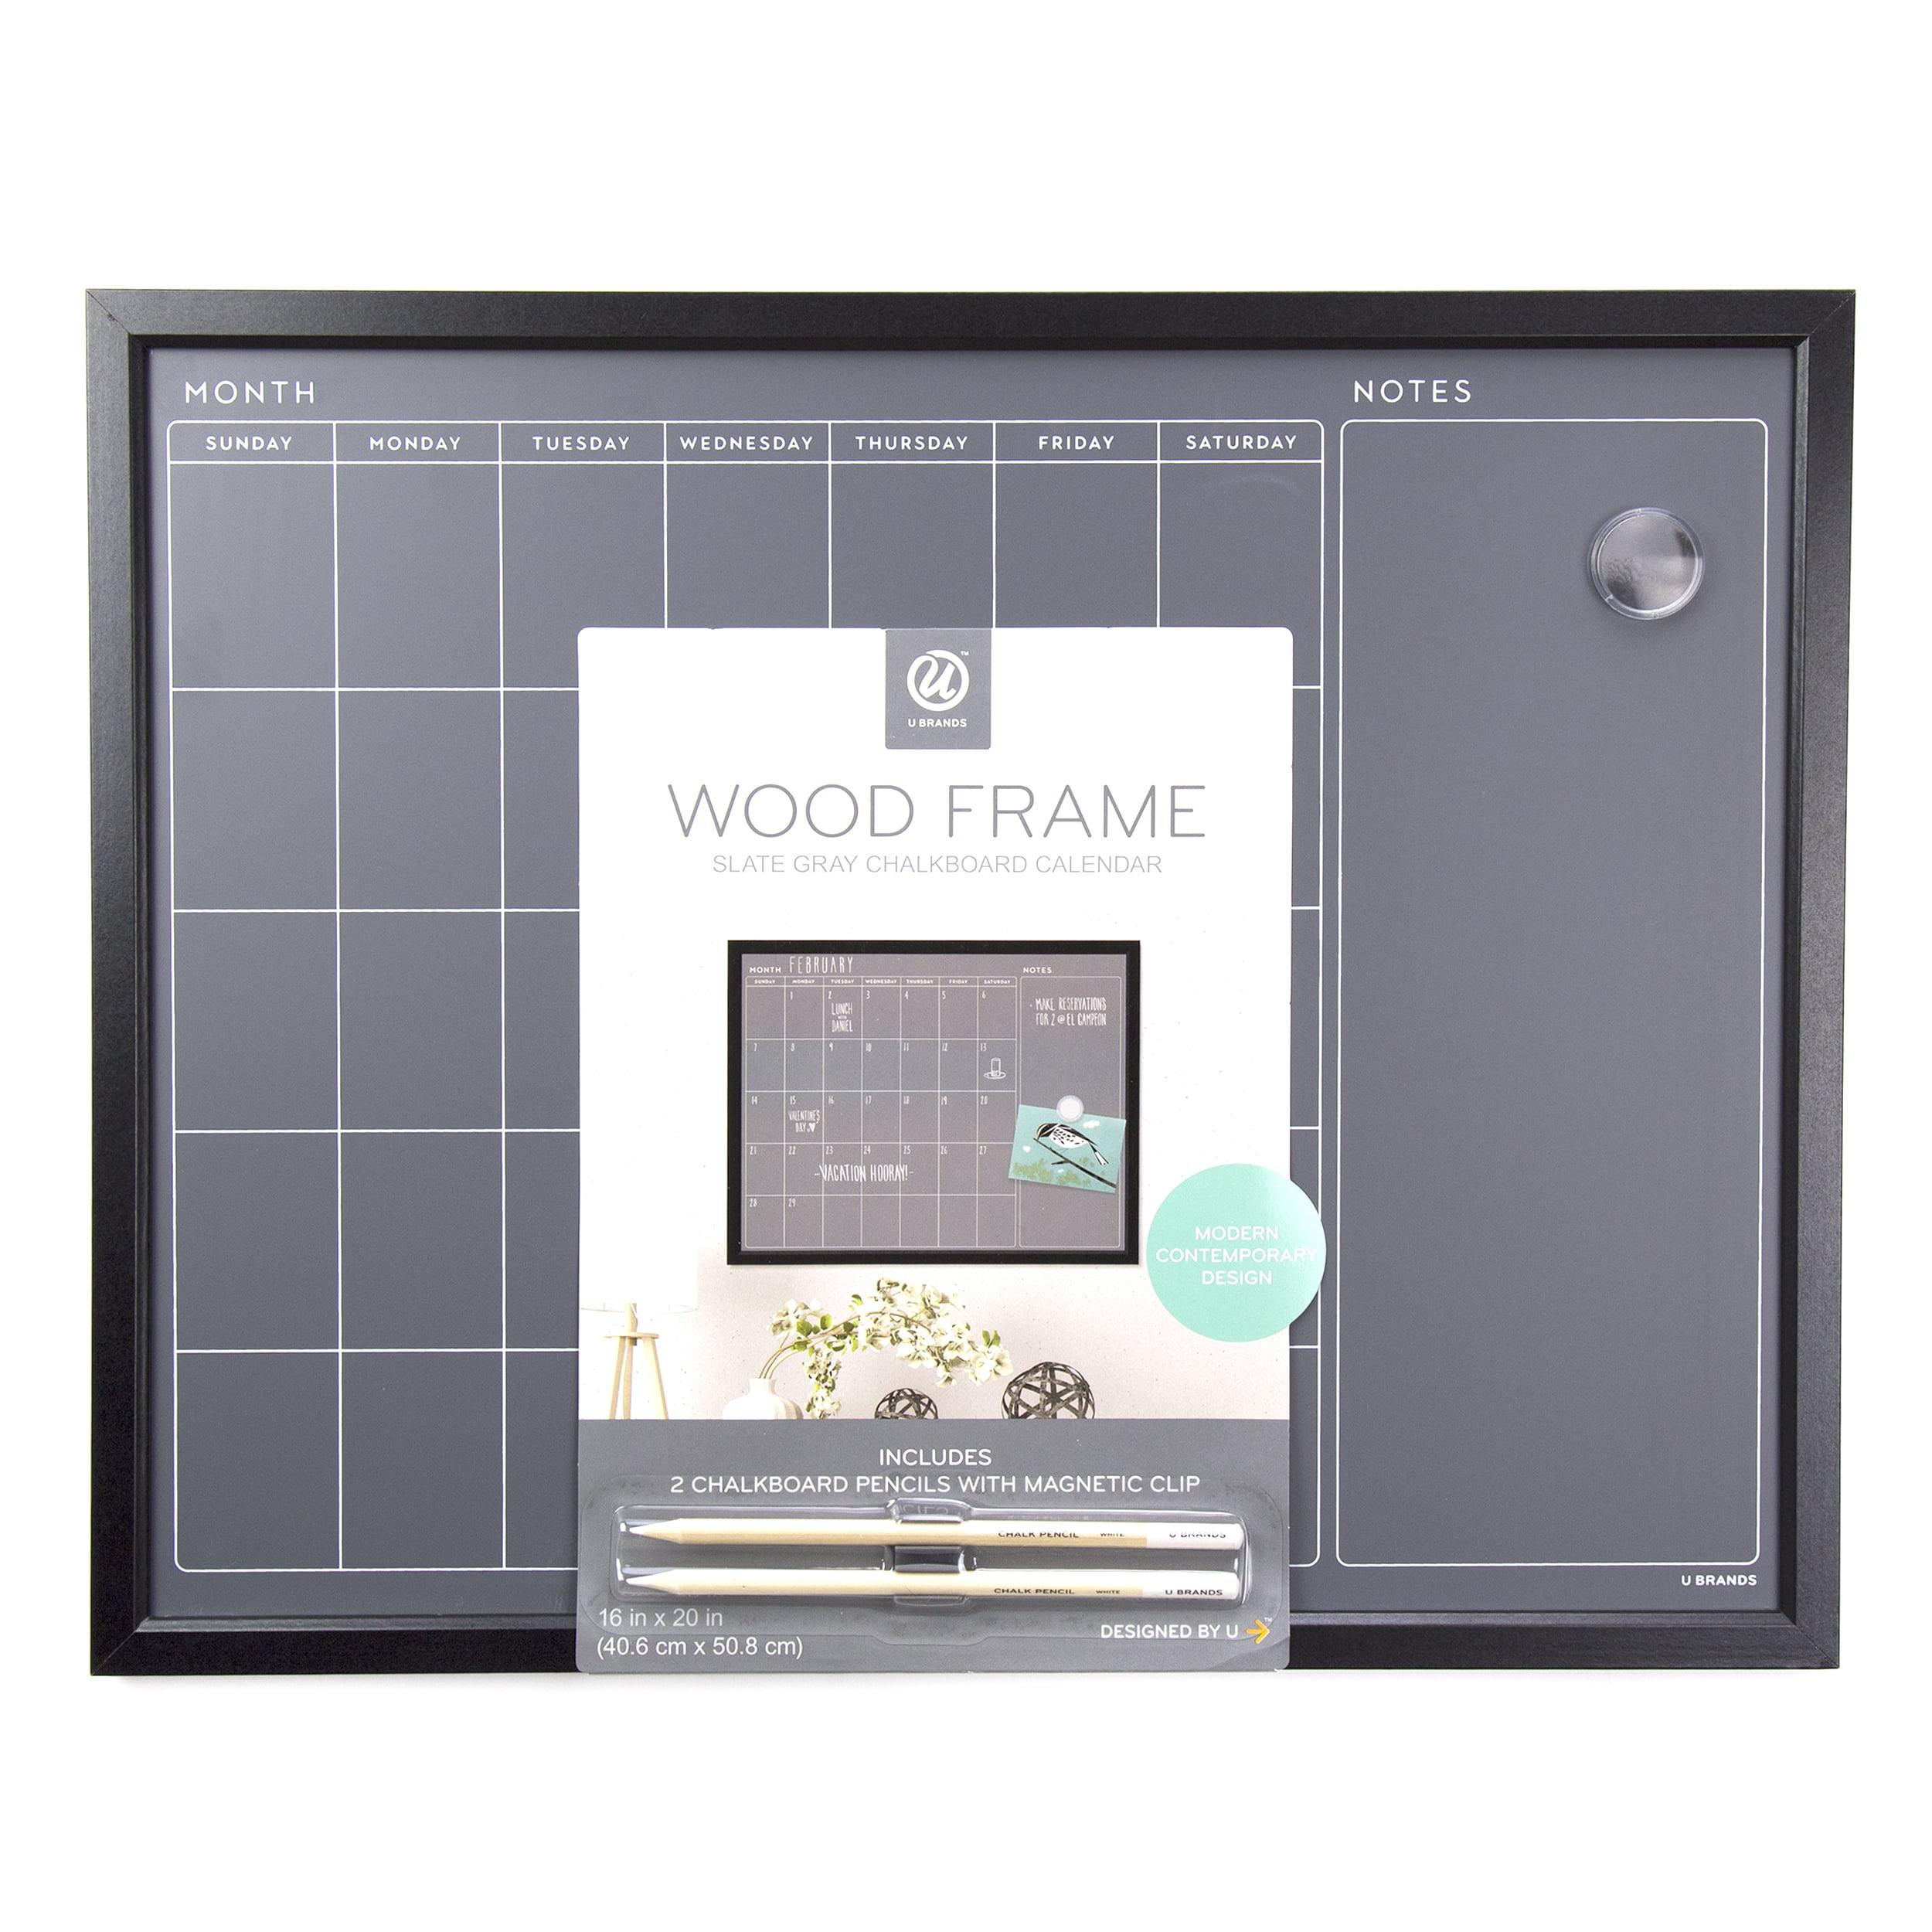 U Brands Monthly Calendar Chalkboard 20 X 16 Inches Black Mdf